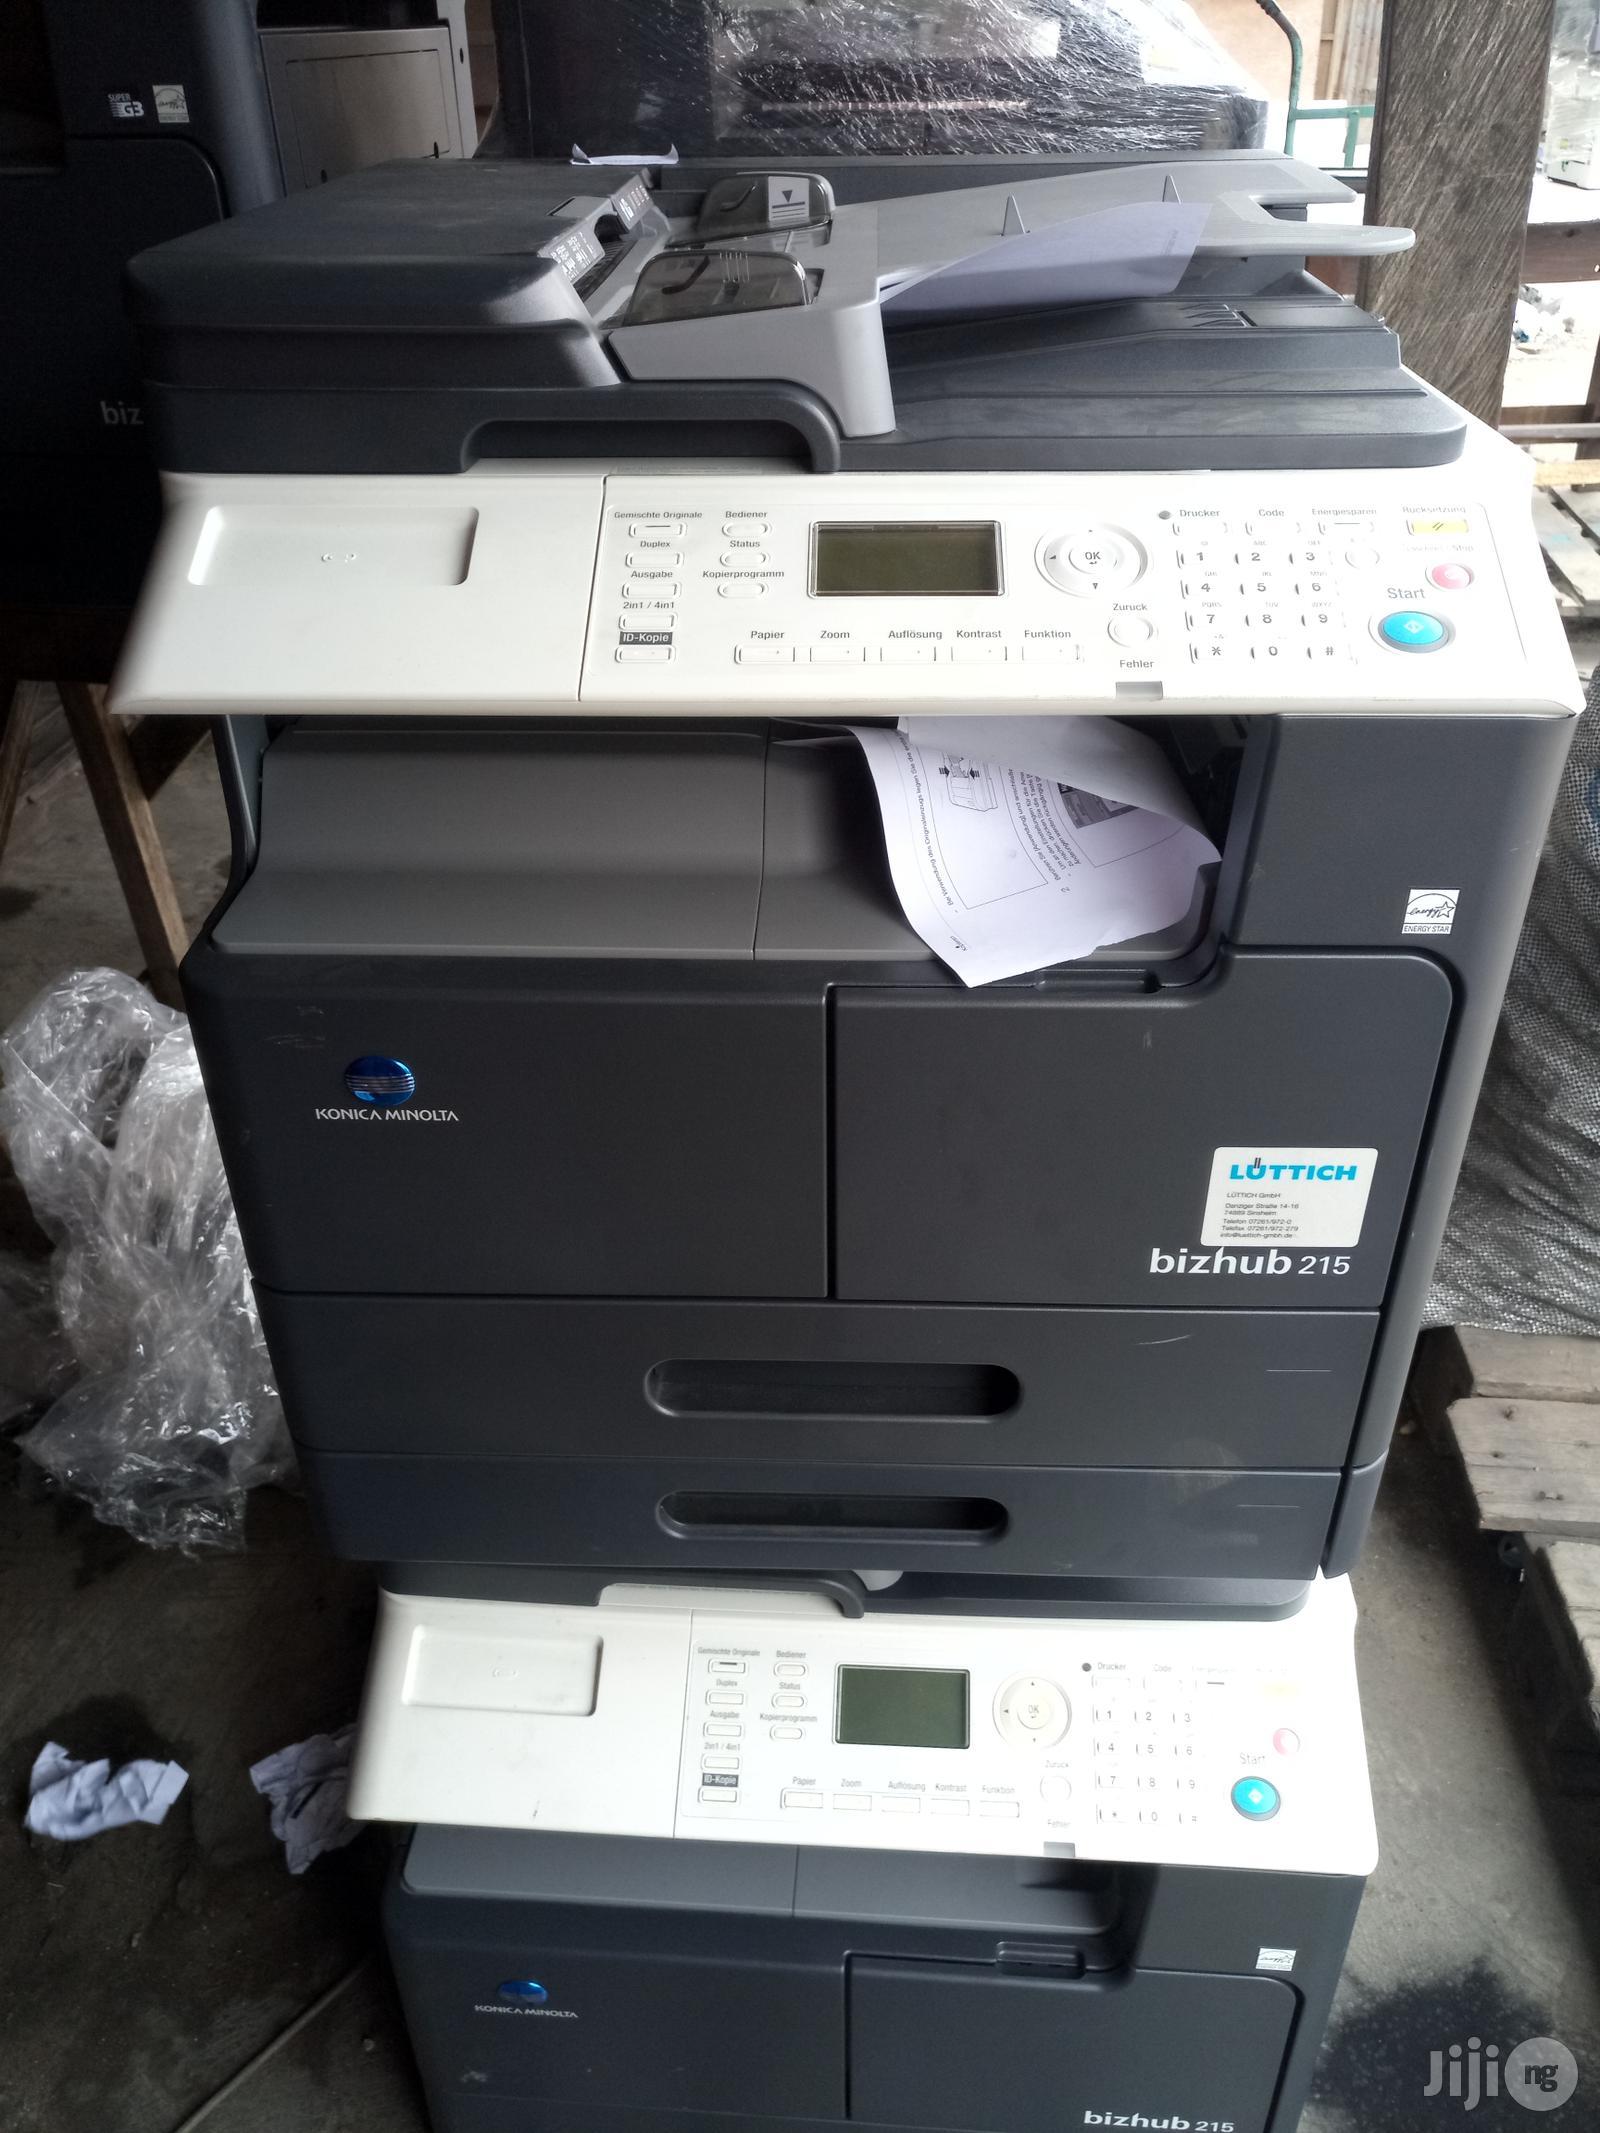 Archive: Konica Minolta Bizhub 215 Photocopier